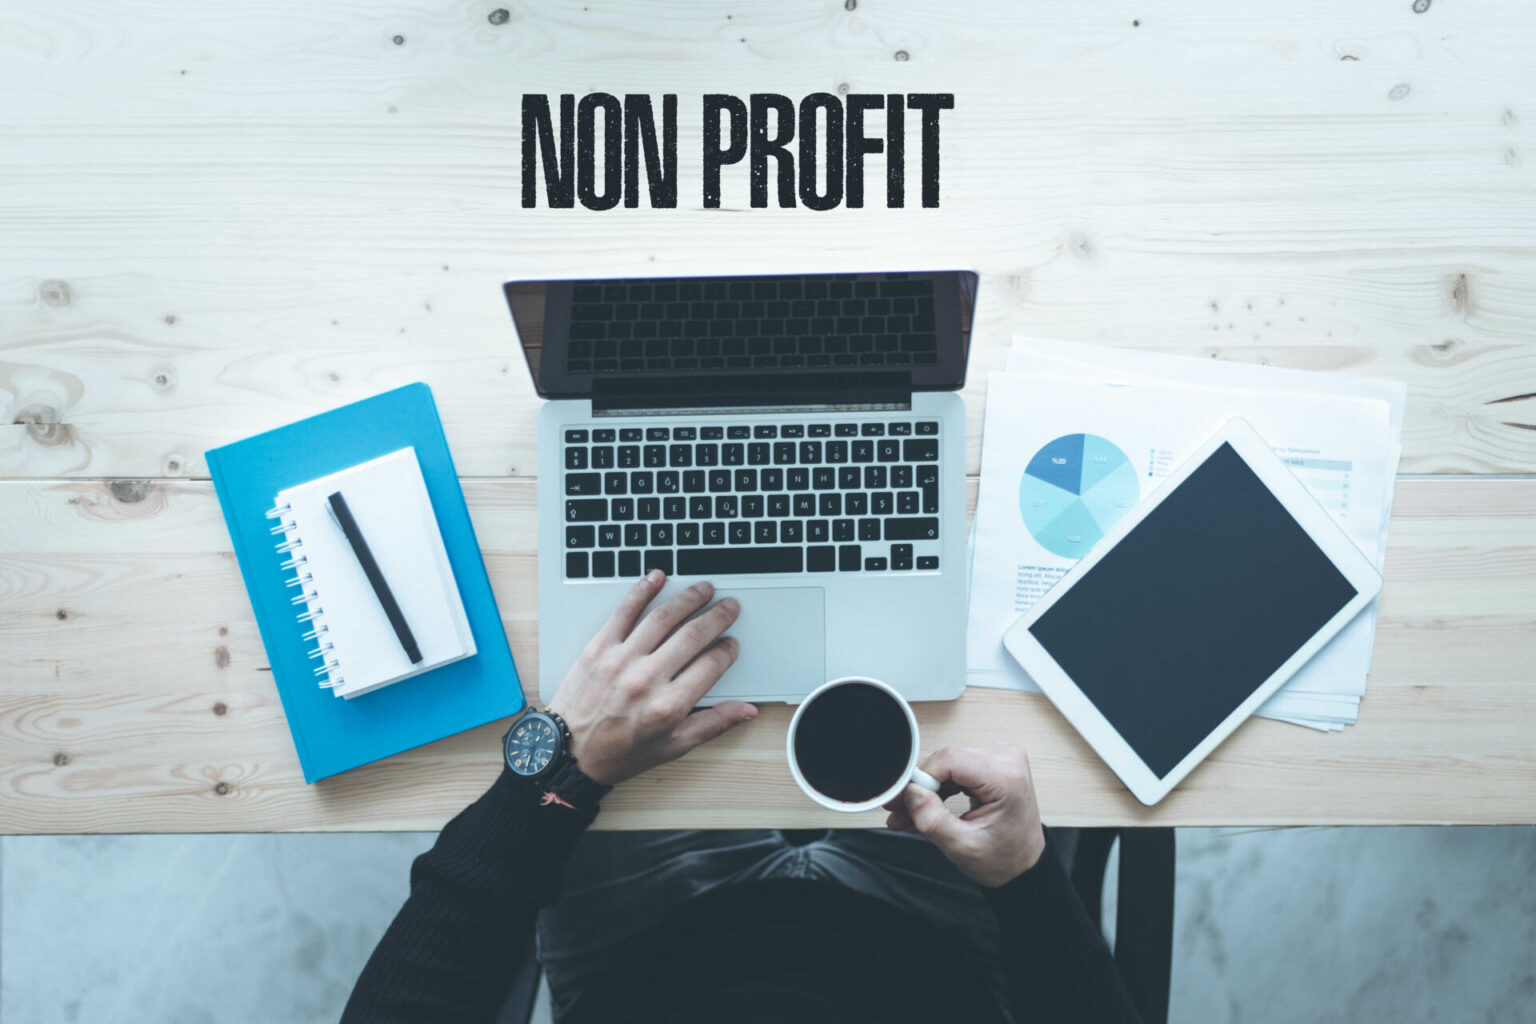 technology_nonprofits